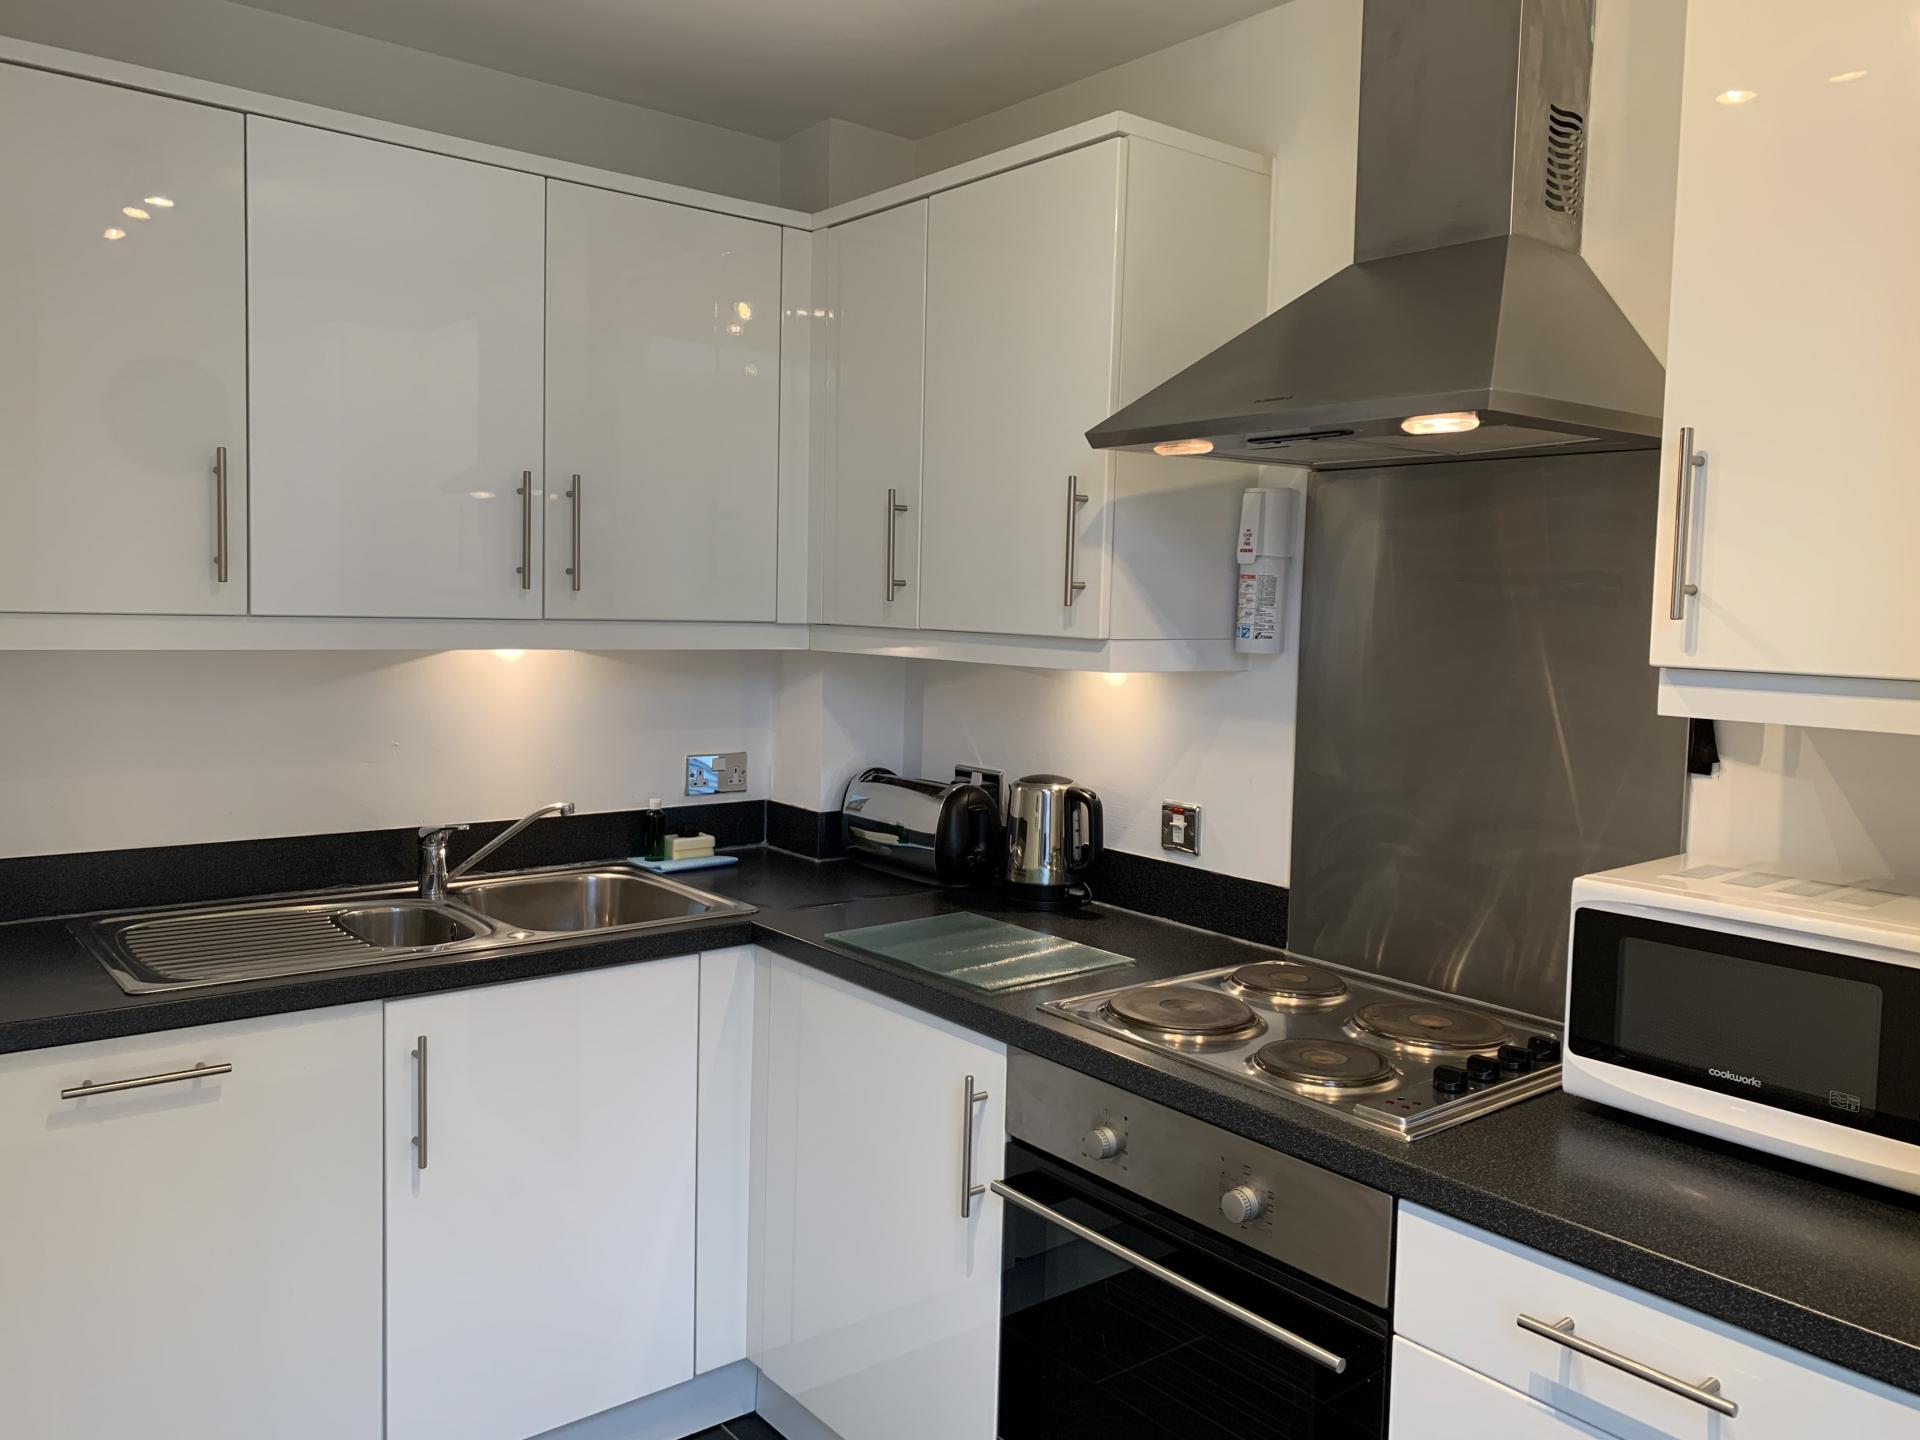 Kitchen at Cotels The Hub Apartments, Centre, Milton Keynes - Citybase Apartments